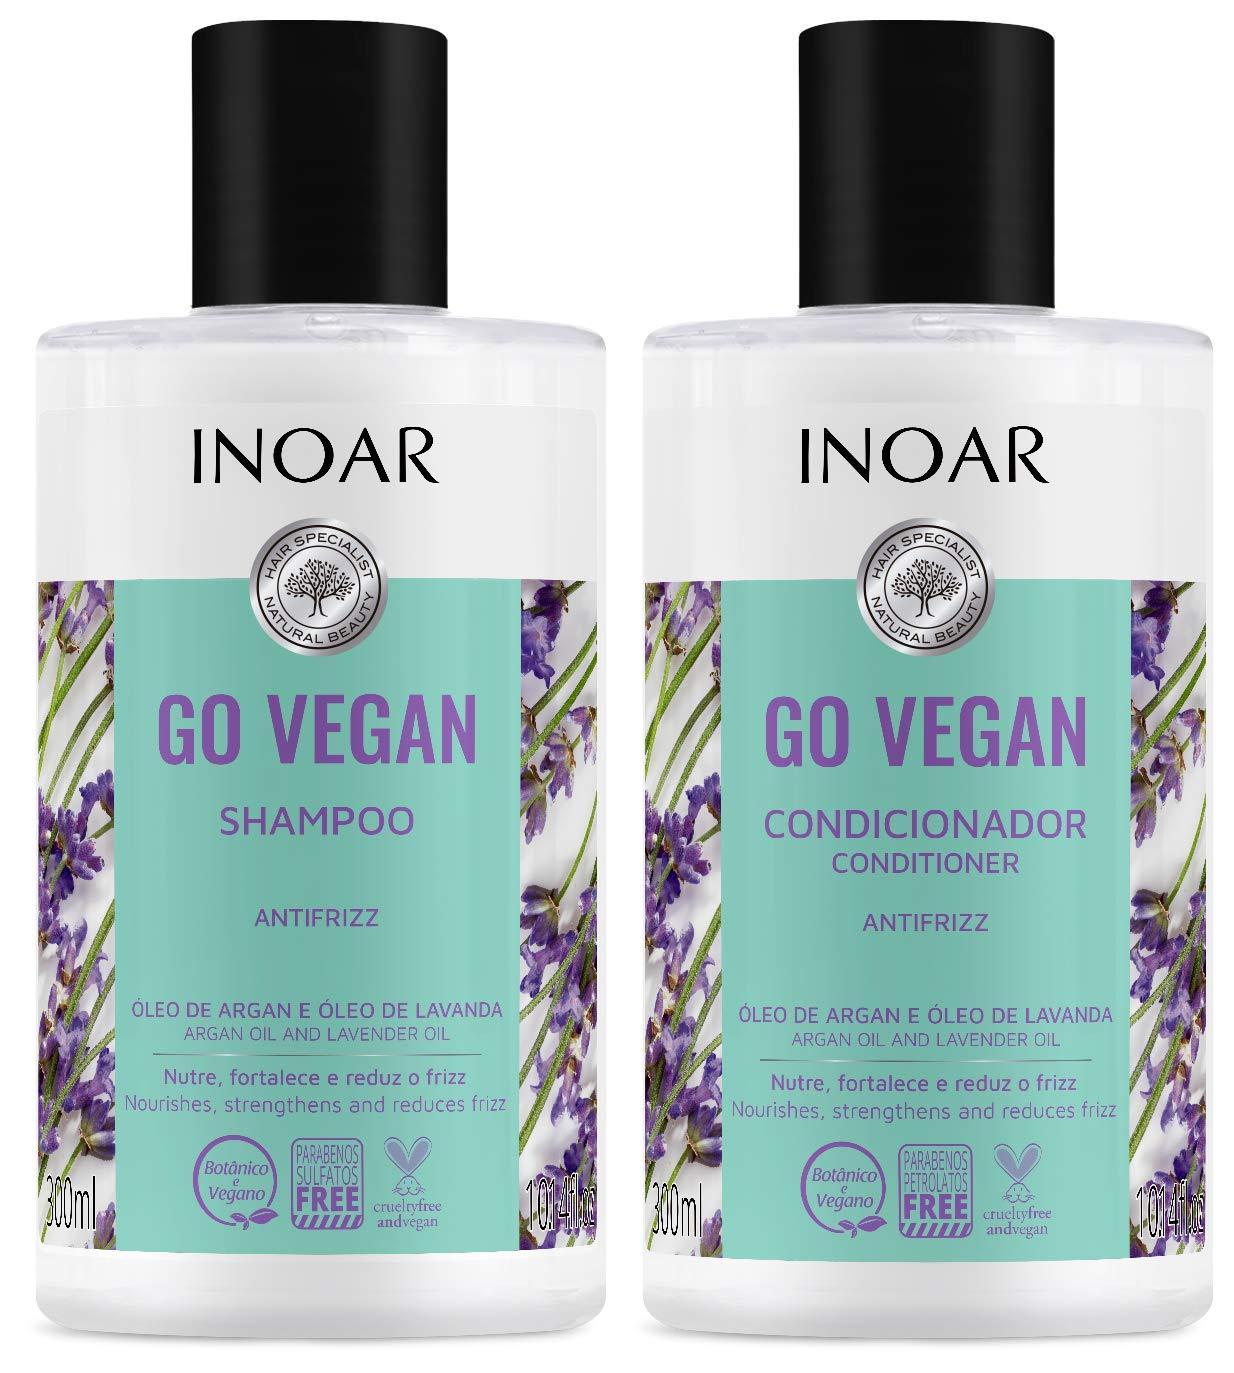 INOAR PROFESSIONAL - Go Vegan Anti-Frizz Hair Mesa Mall Shampoo Conditio High quality new